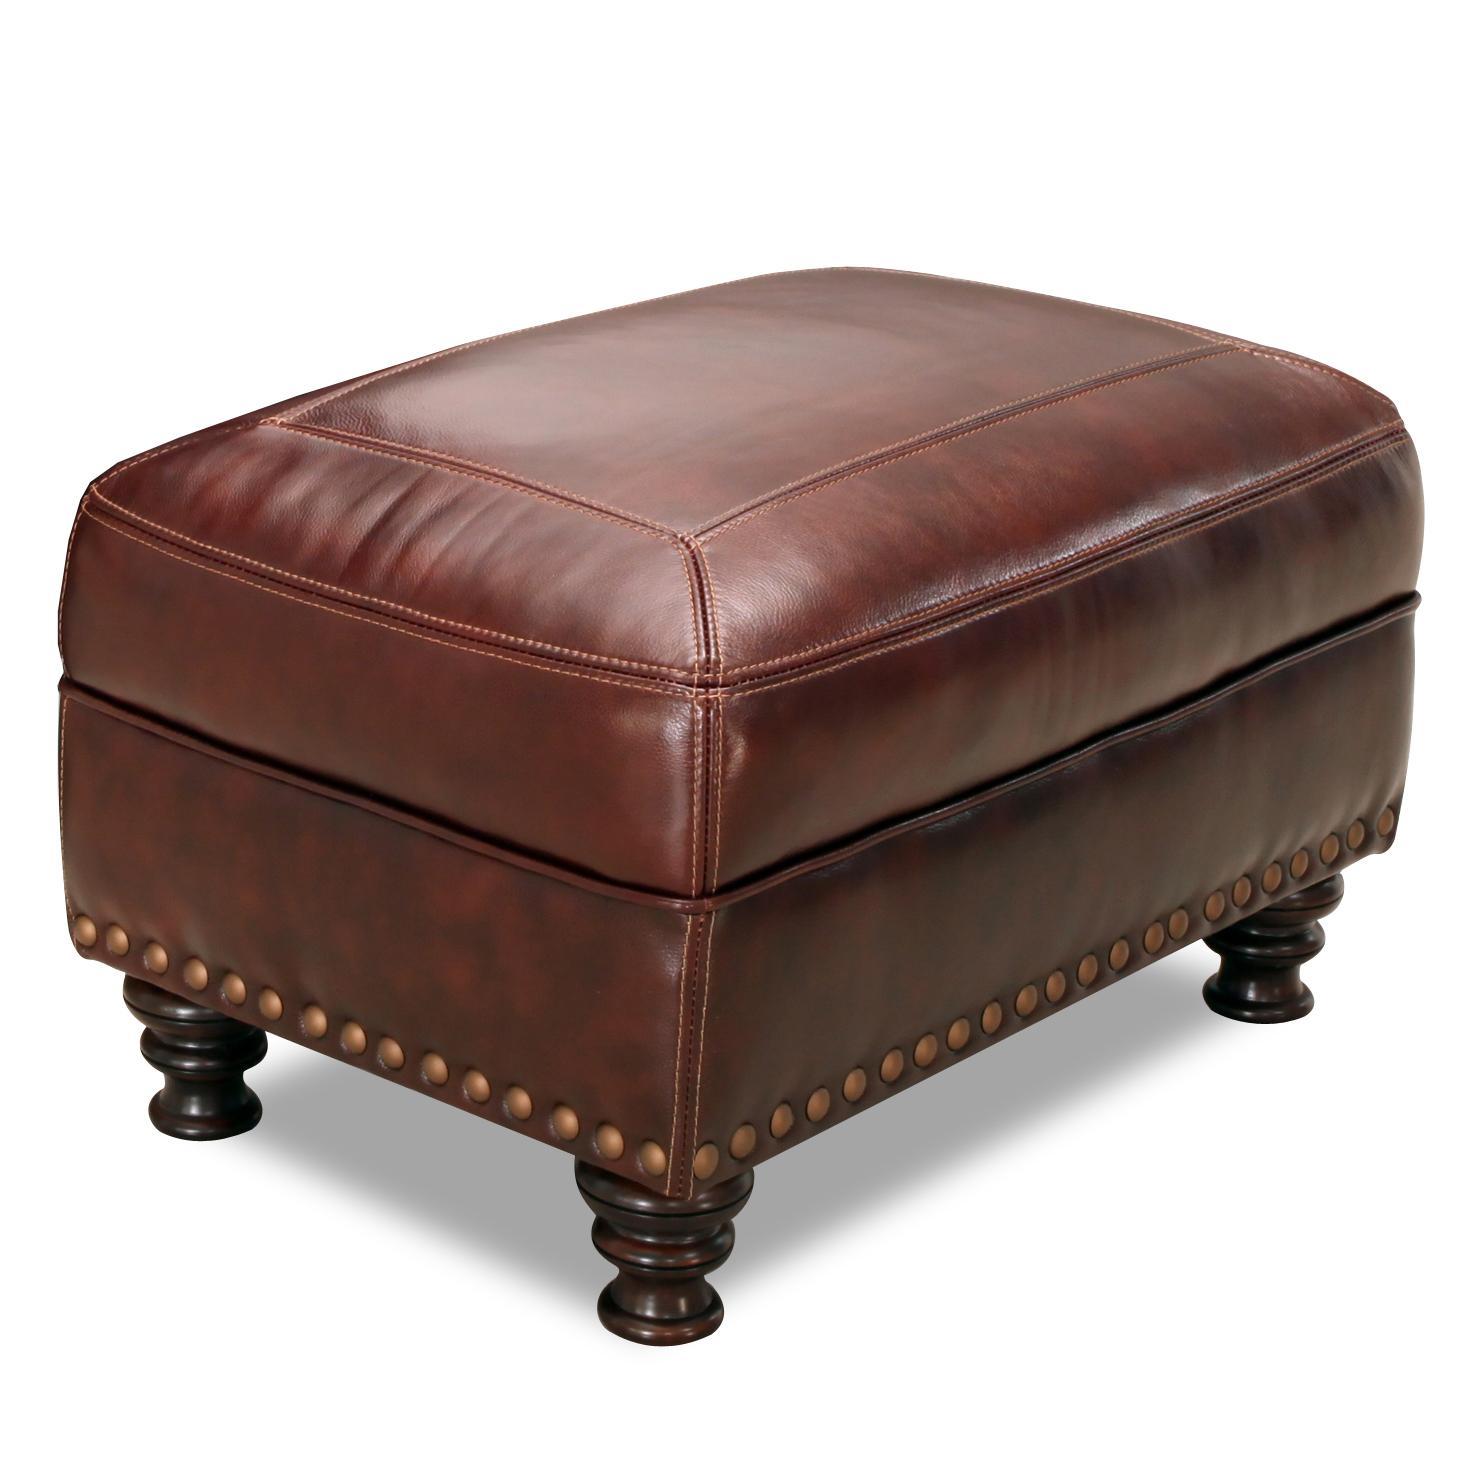 6978 Rectangular Ottoman by Simon Li at Furniture Fair - North Carolina